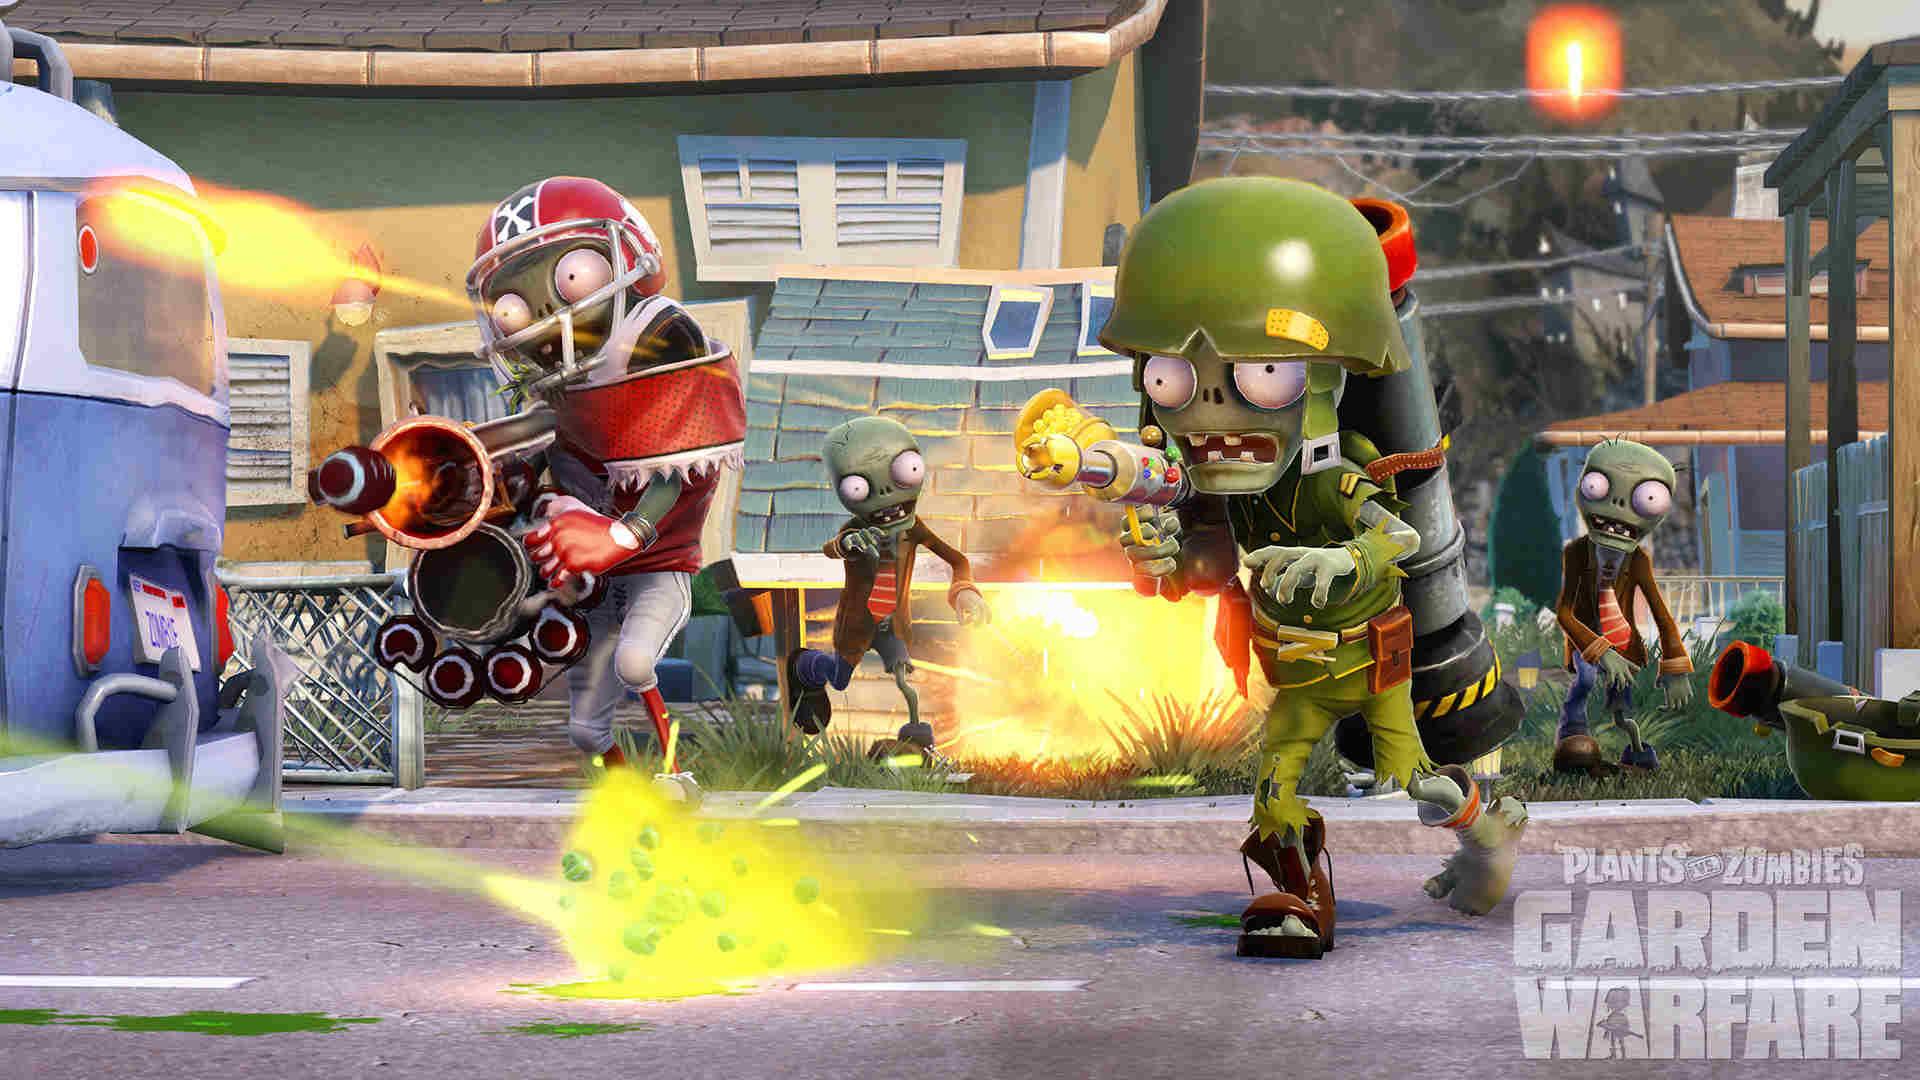 шутер Plant vs Zombie: Garden Warfare